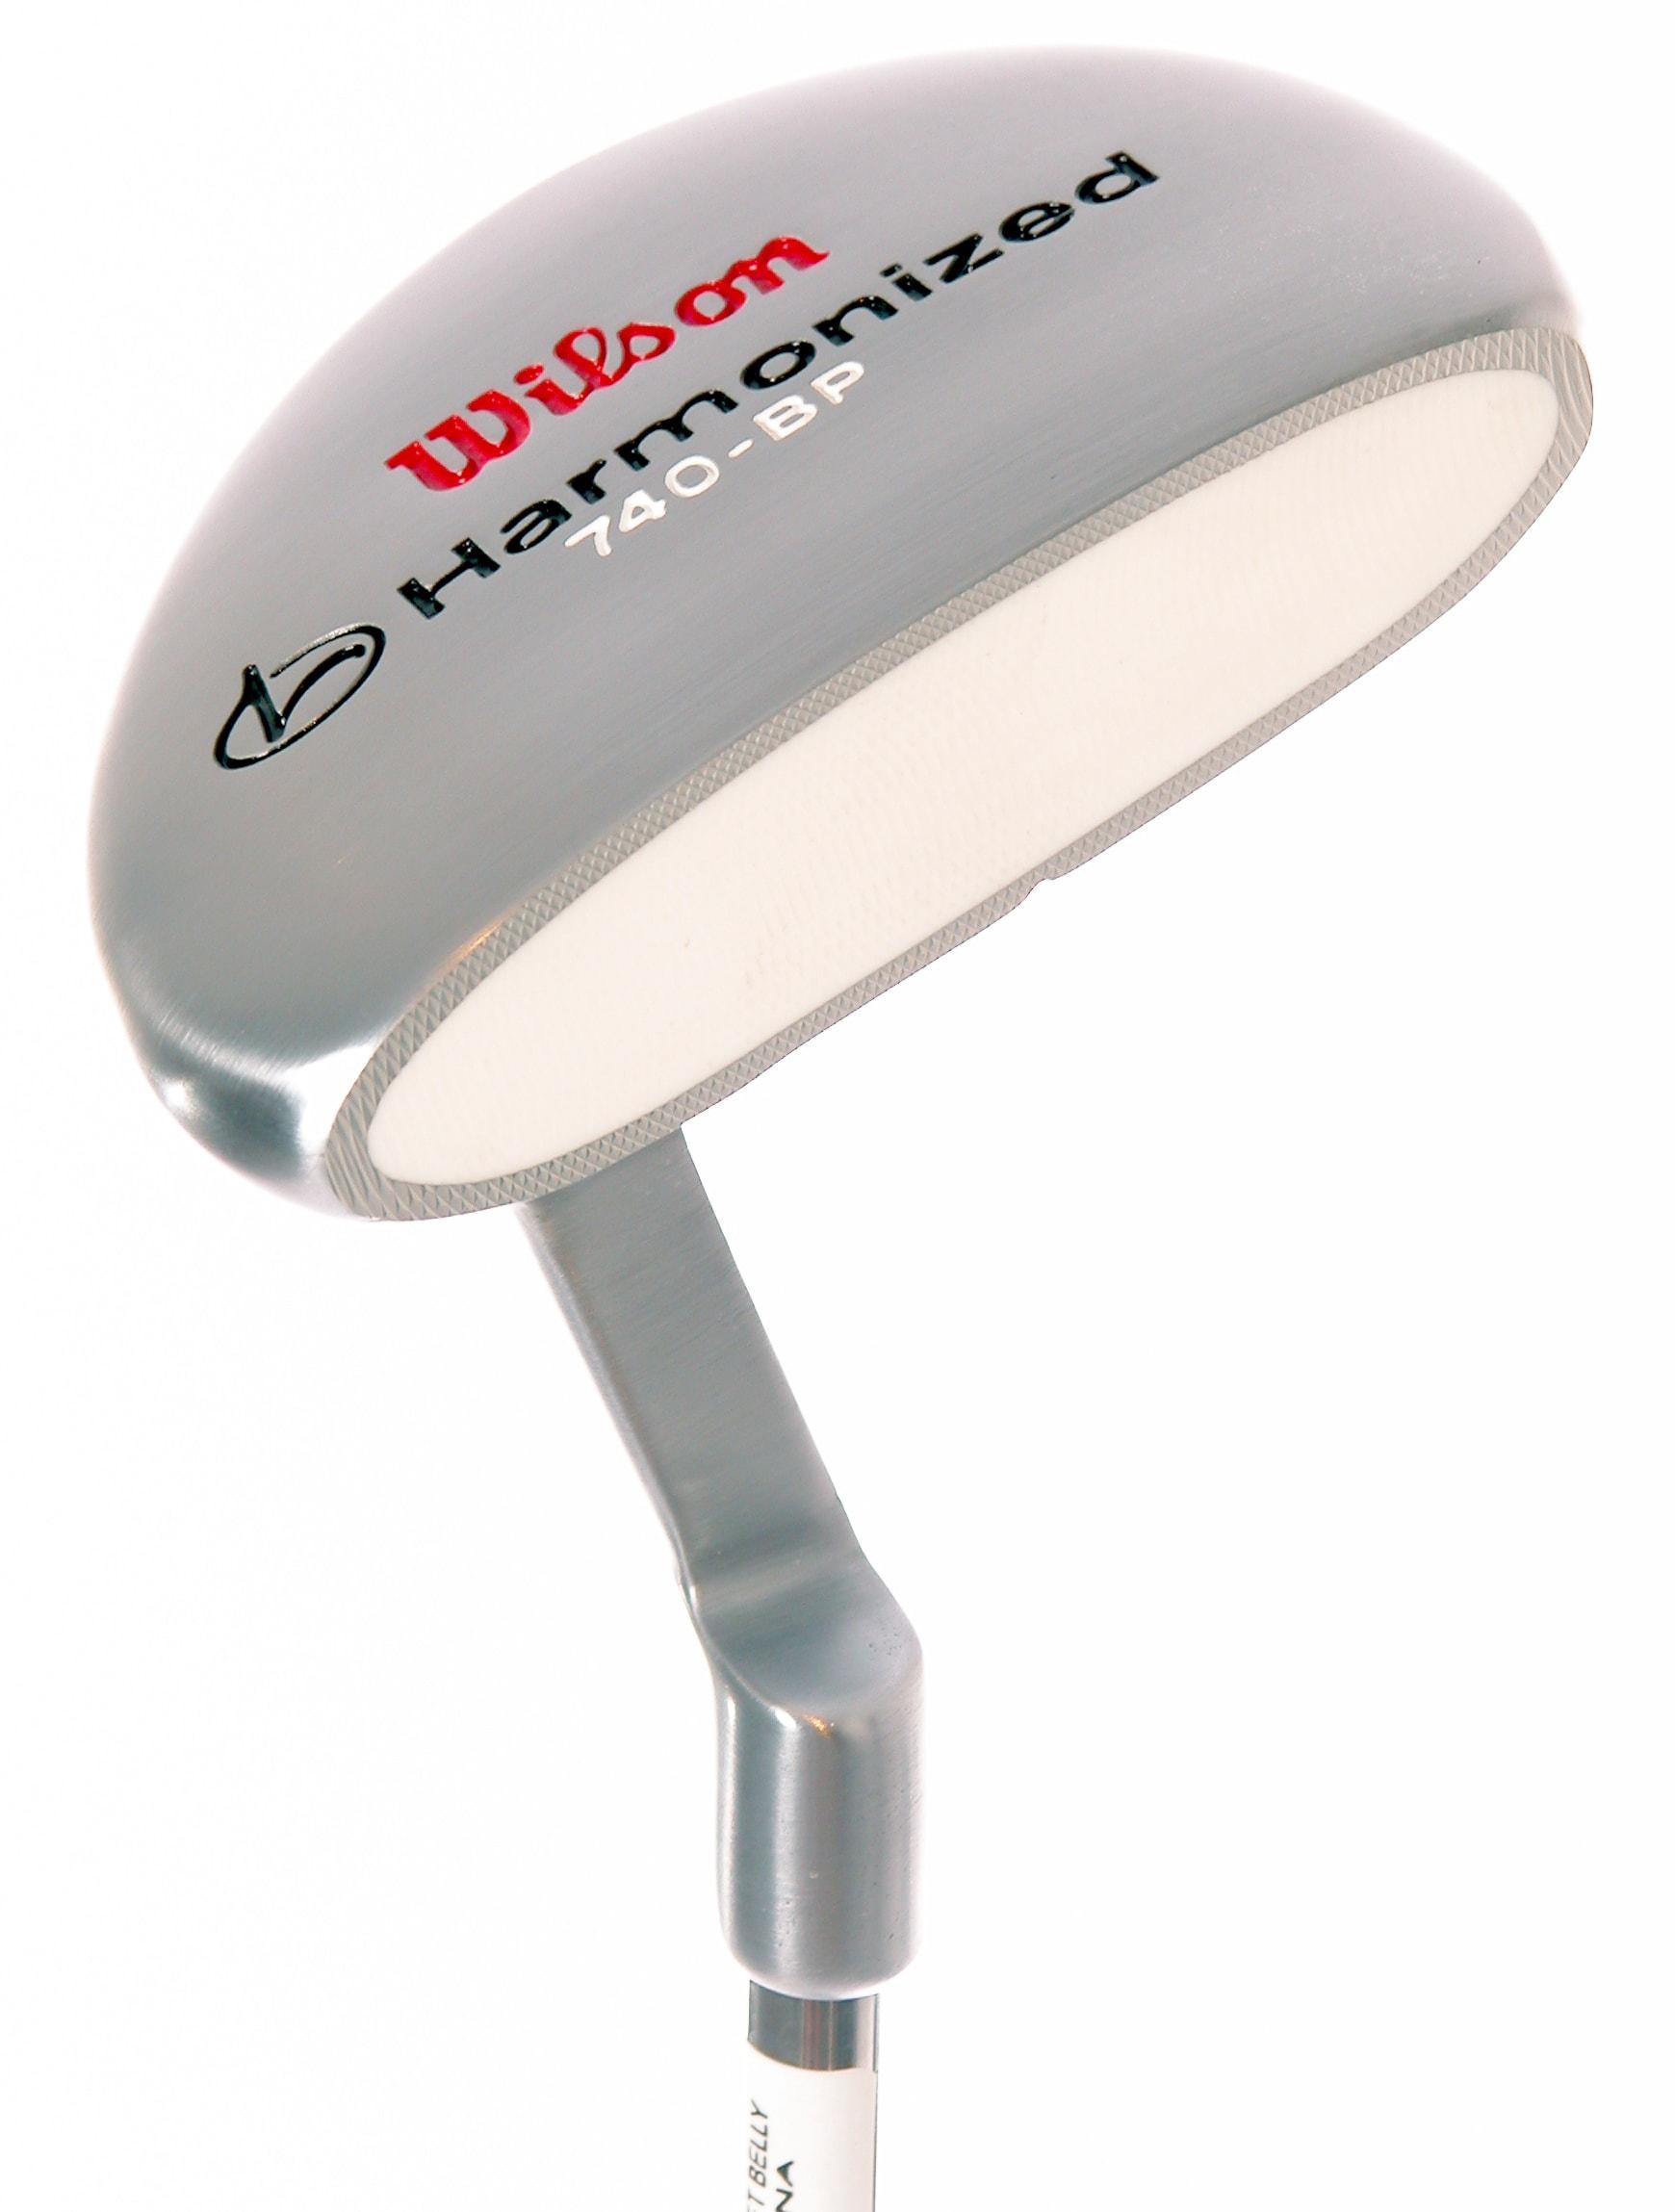 Wilson Golf Harmonized 740-BP RH Belly Putter - Thumbnail 1